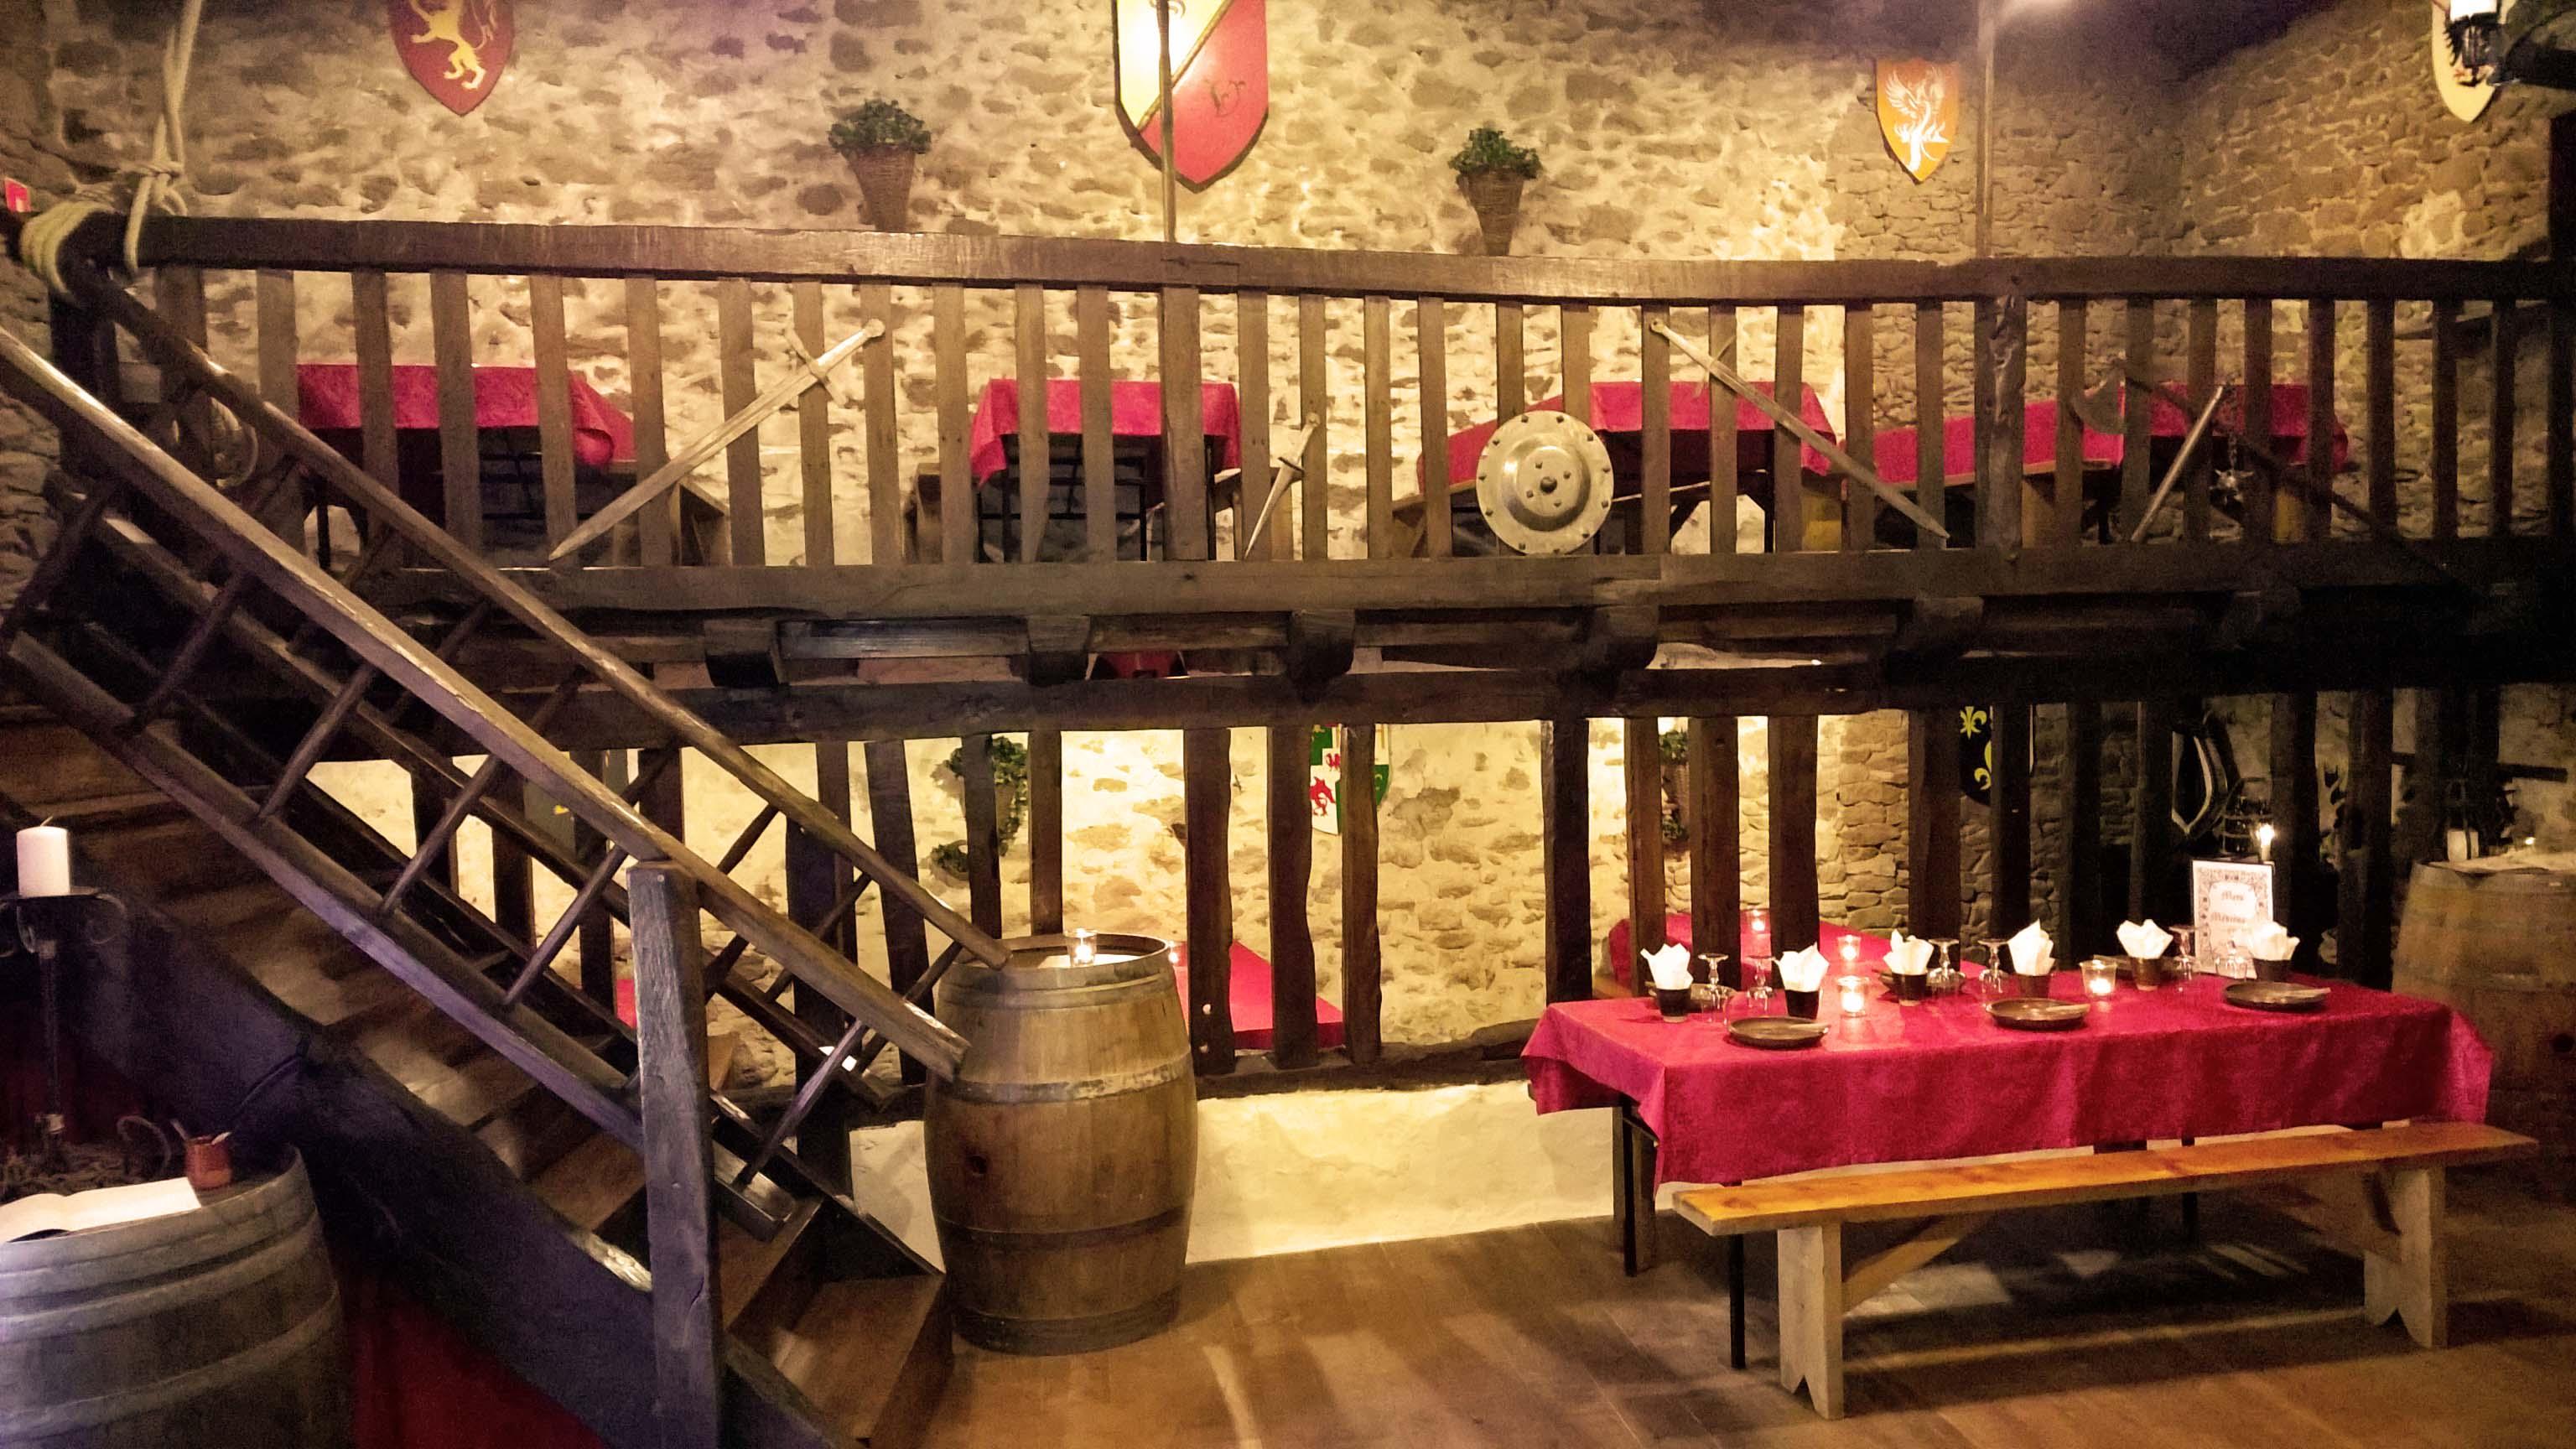 Vallicella taverne et auberge m di vale organisation de for Restaurant la cuisine limoges